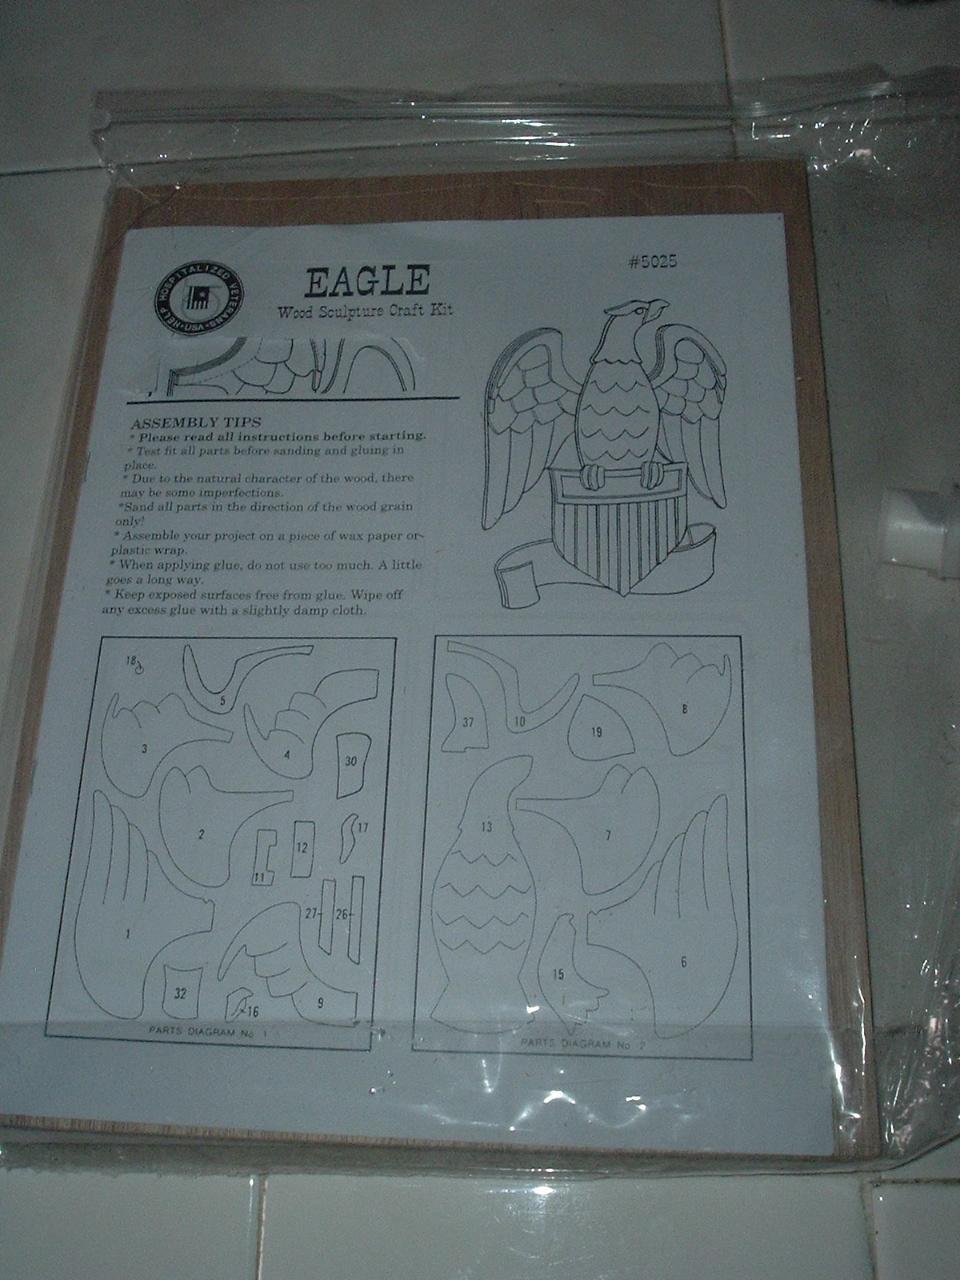 Eagle Wood Sculpture Craft Kit. - New